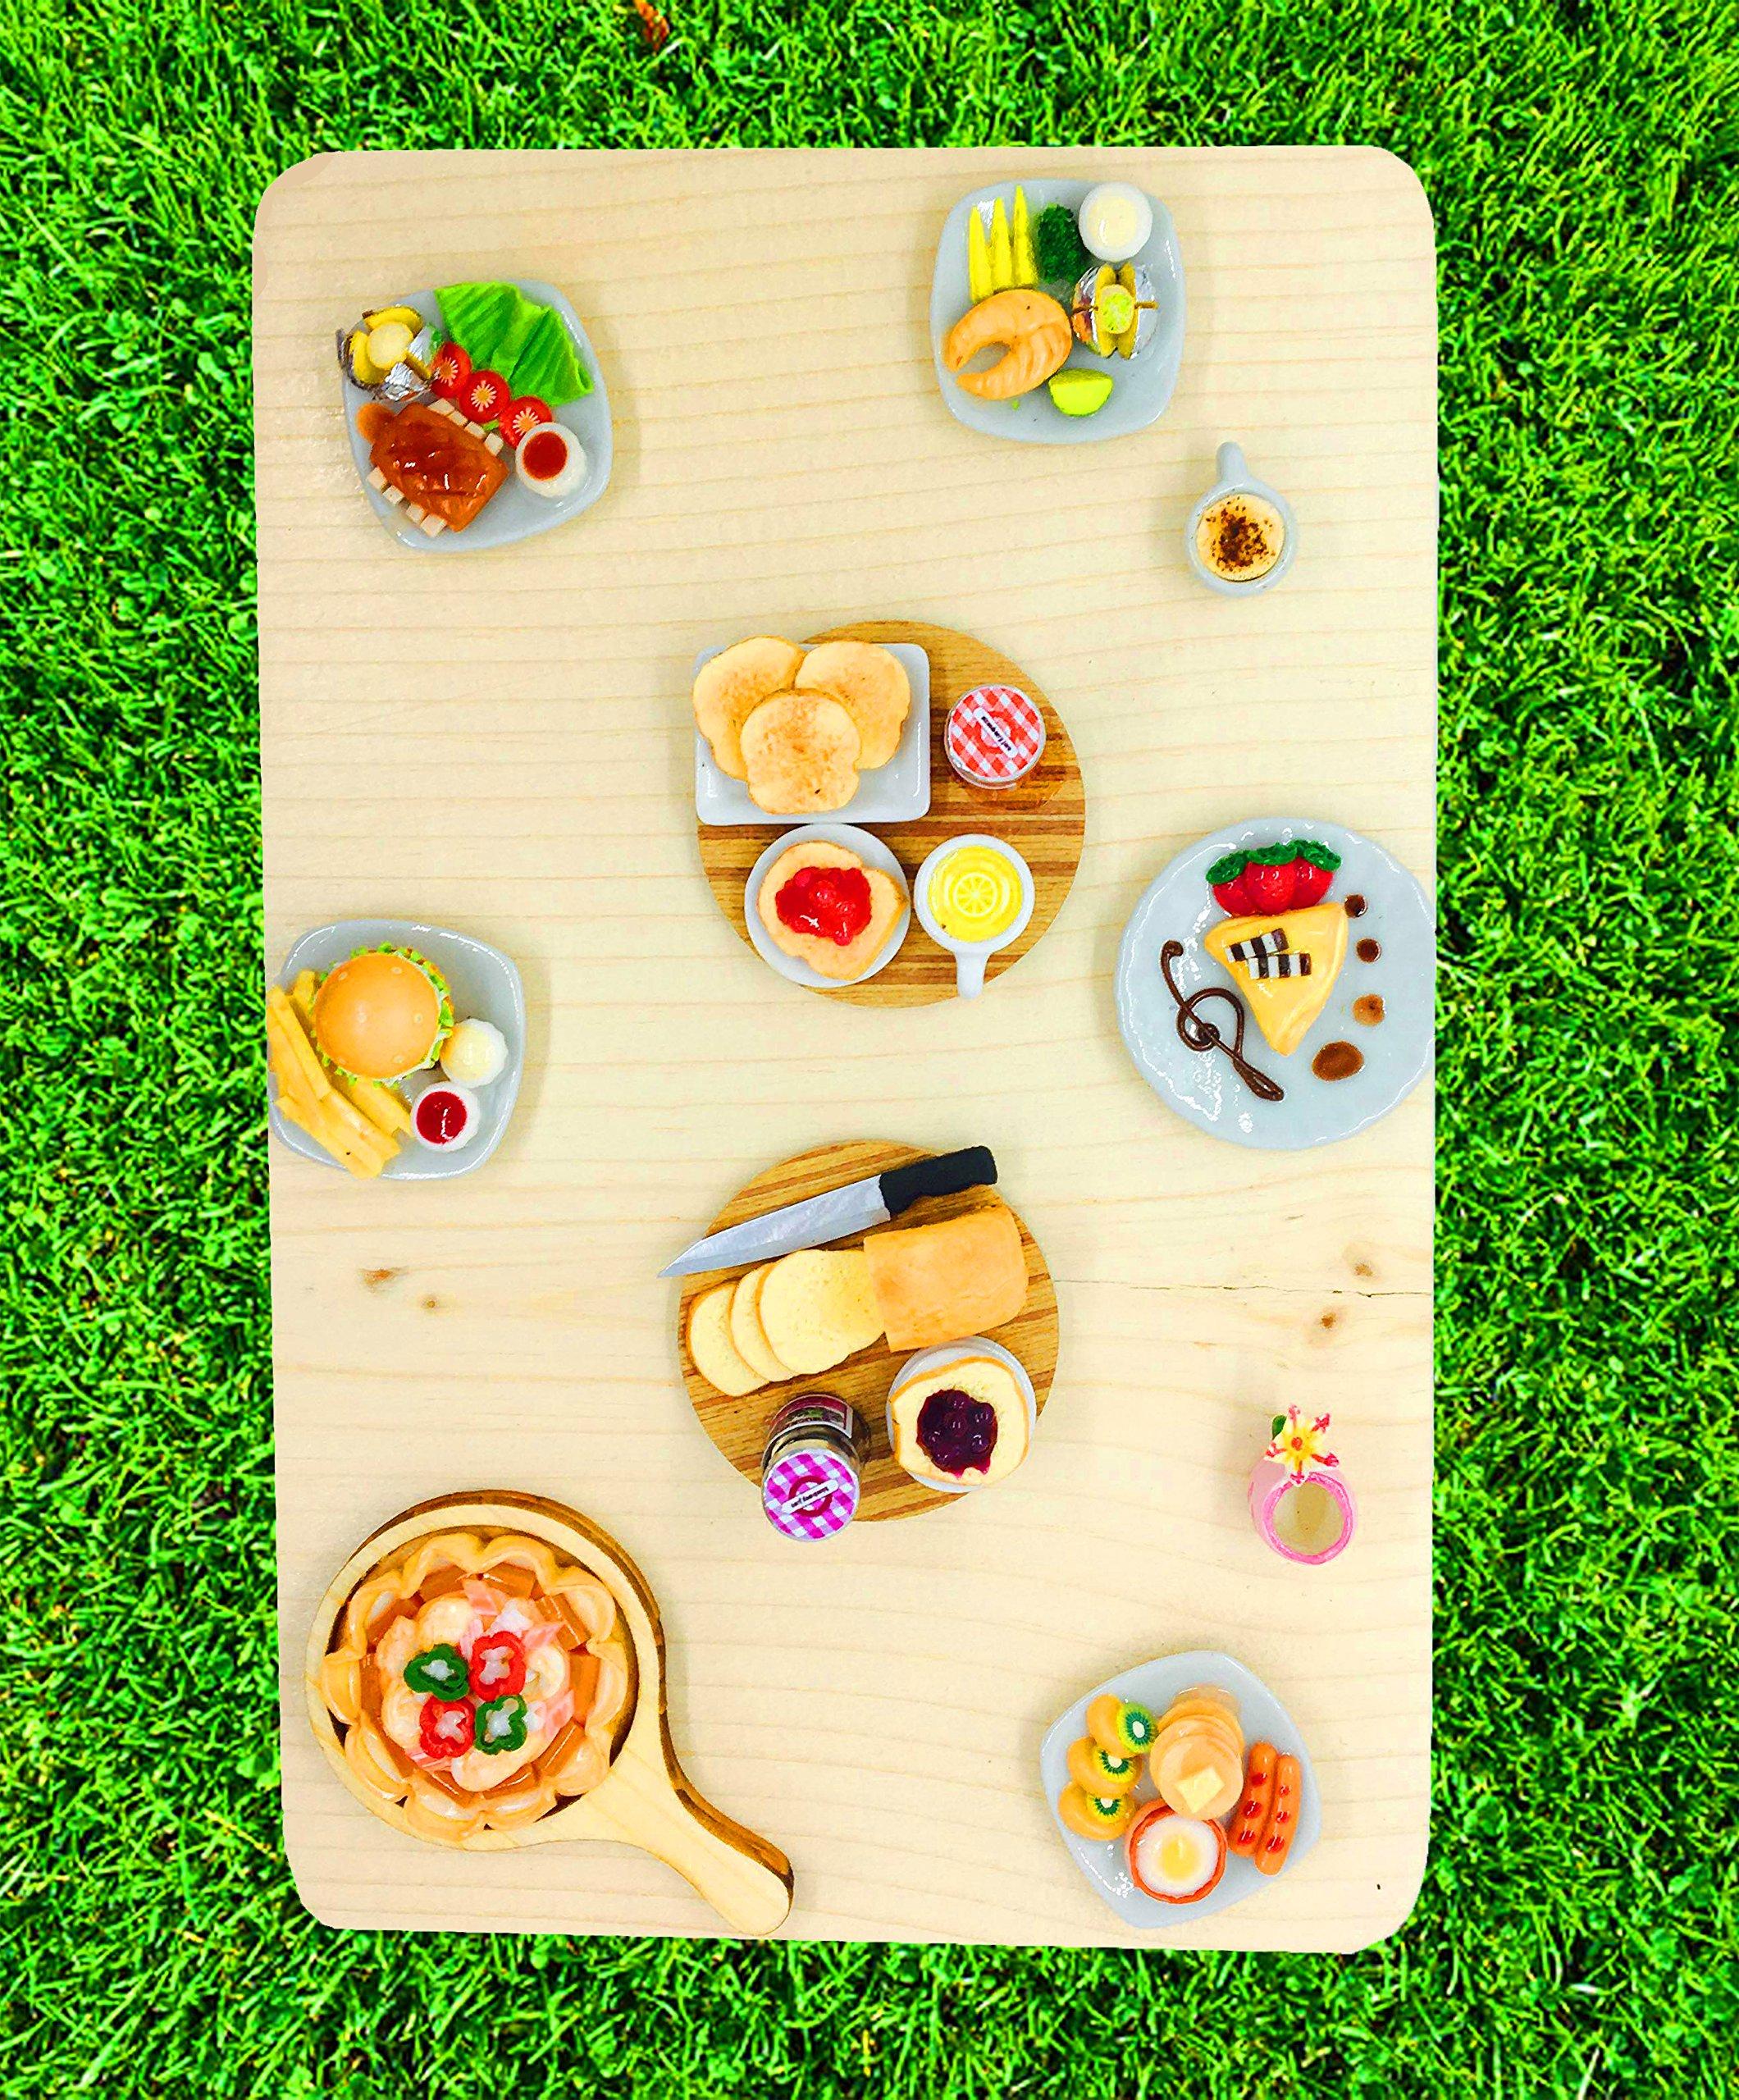 Little World Dollhouse Miniature Food: Breakfast Set [ Strawberry Yam, Toast and Lemon Tea], Breakfast Set Collectibles, Size 1.38' [3.5 cm] Diameter,The Same Size as Barbie Dollhouse.